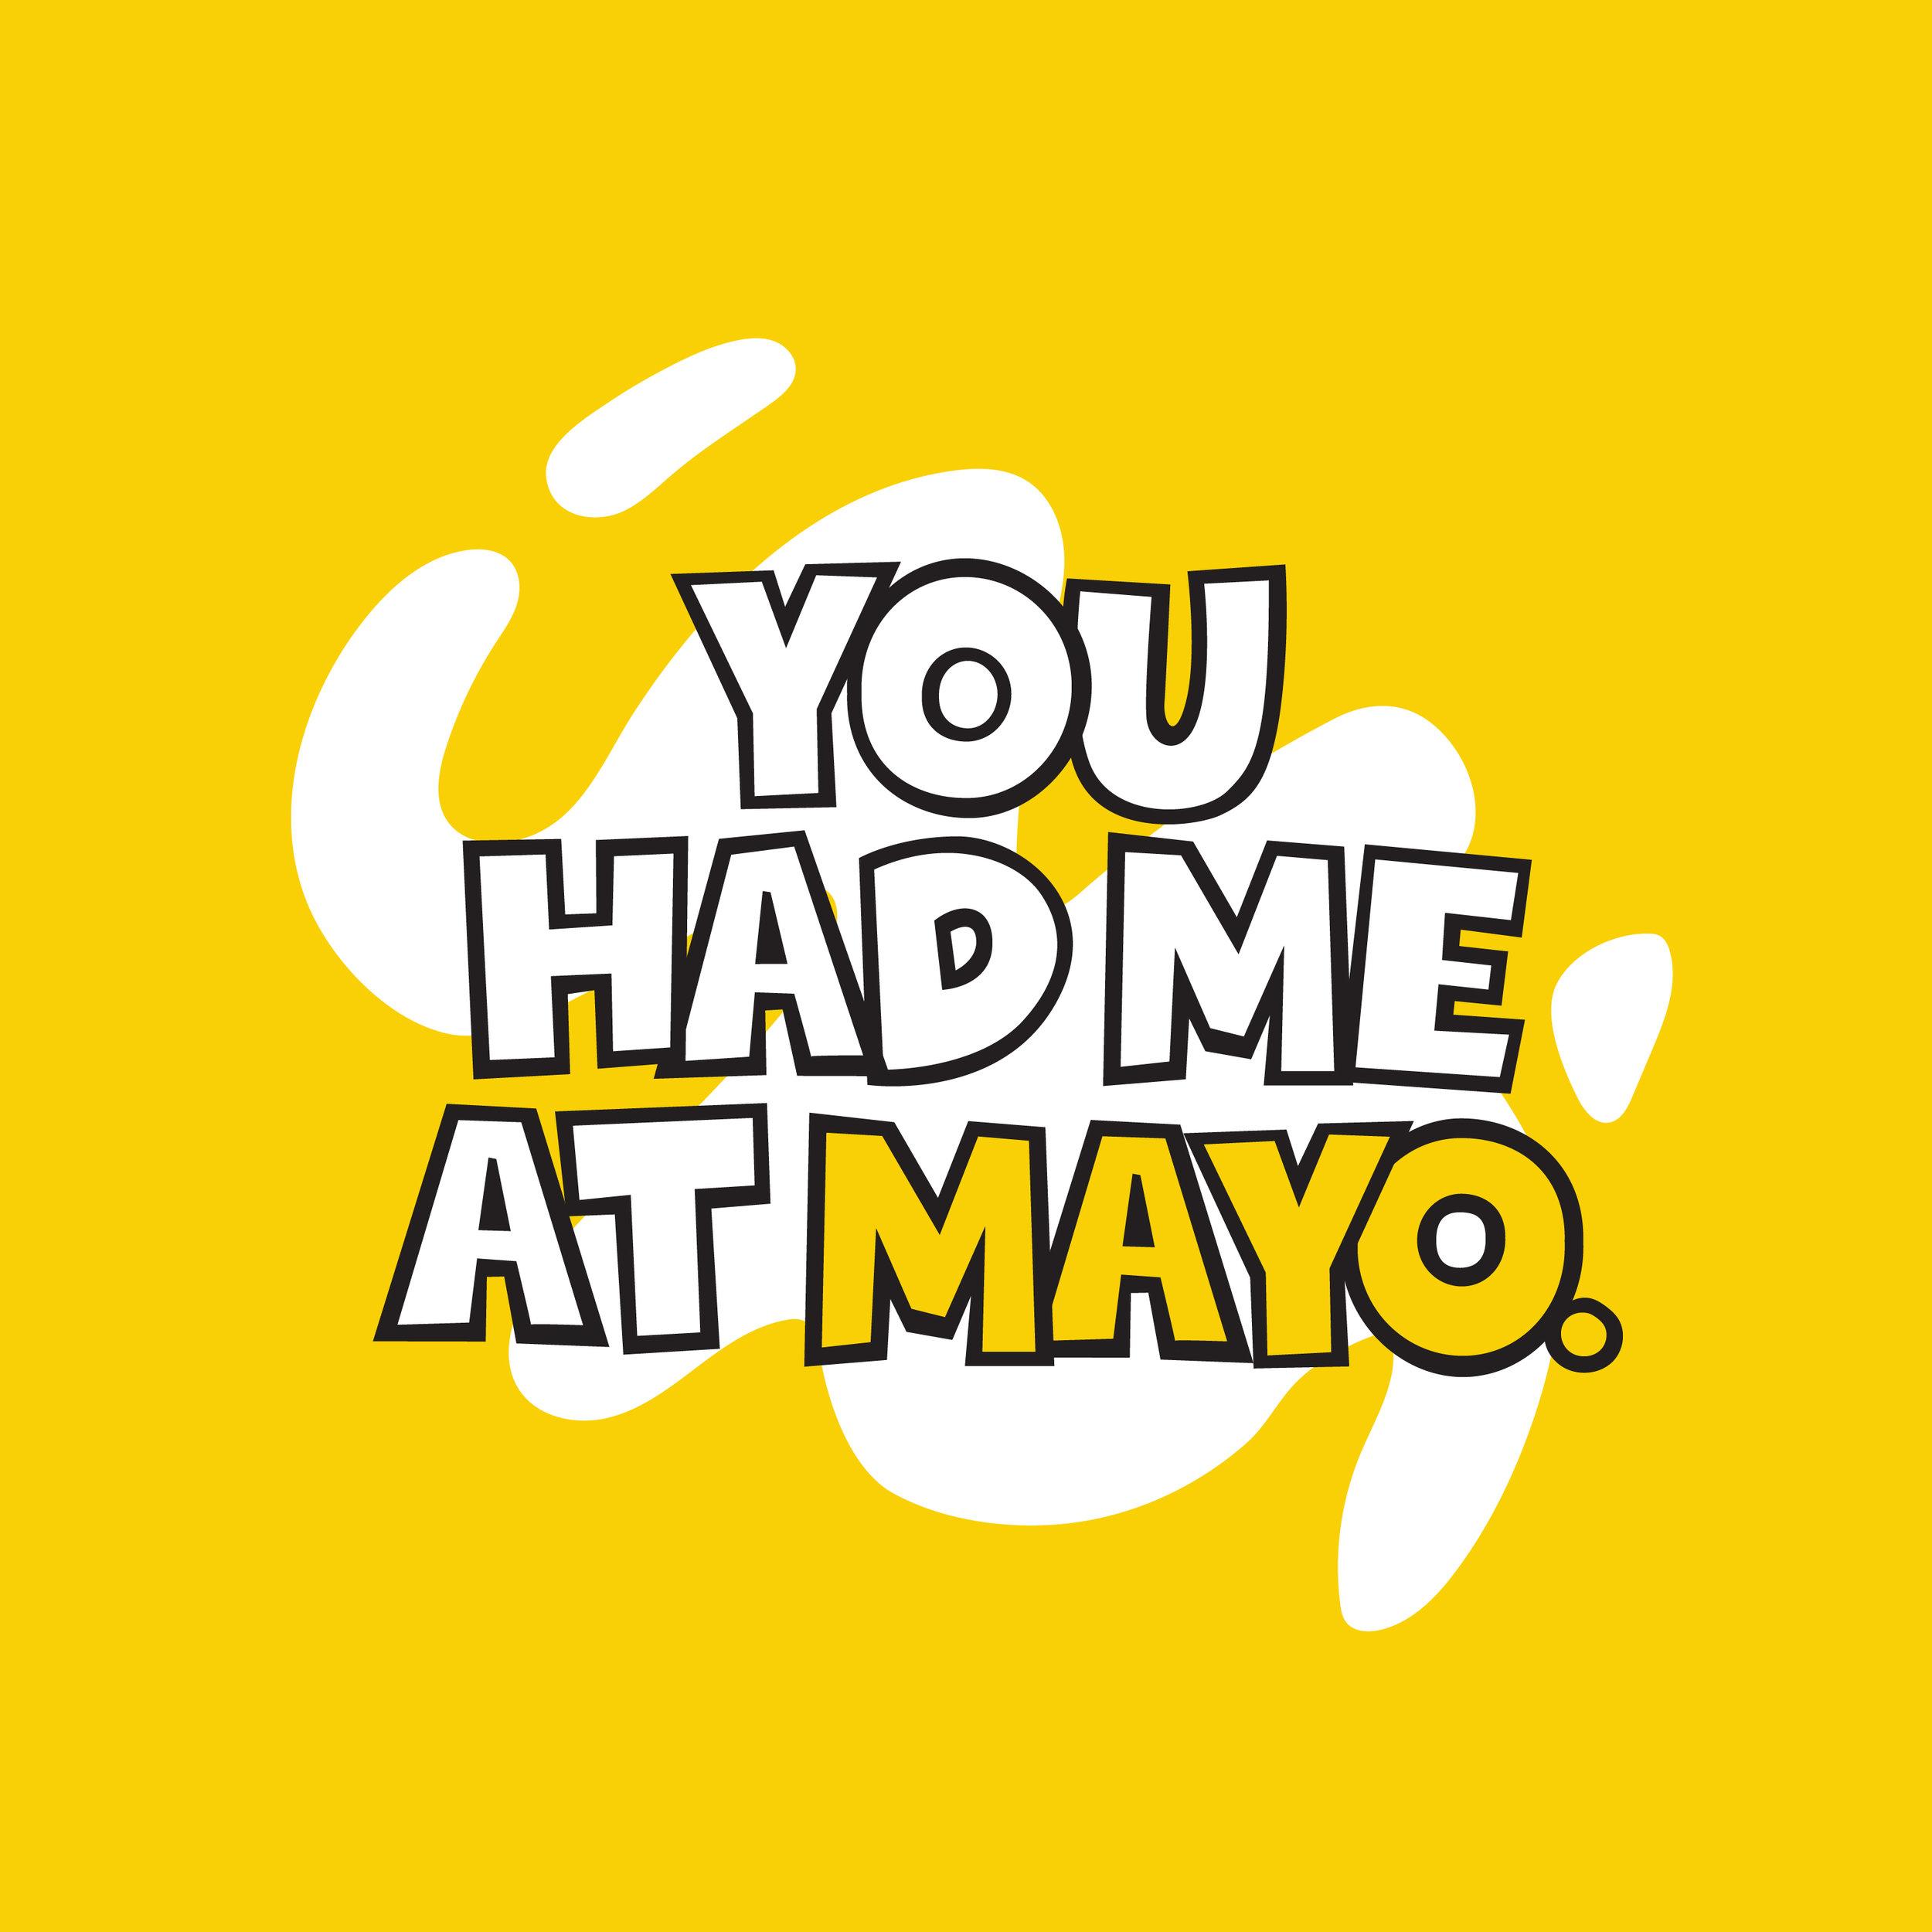 BTH_IG_You had me at Mayo.jpg